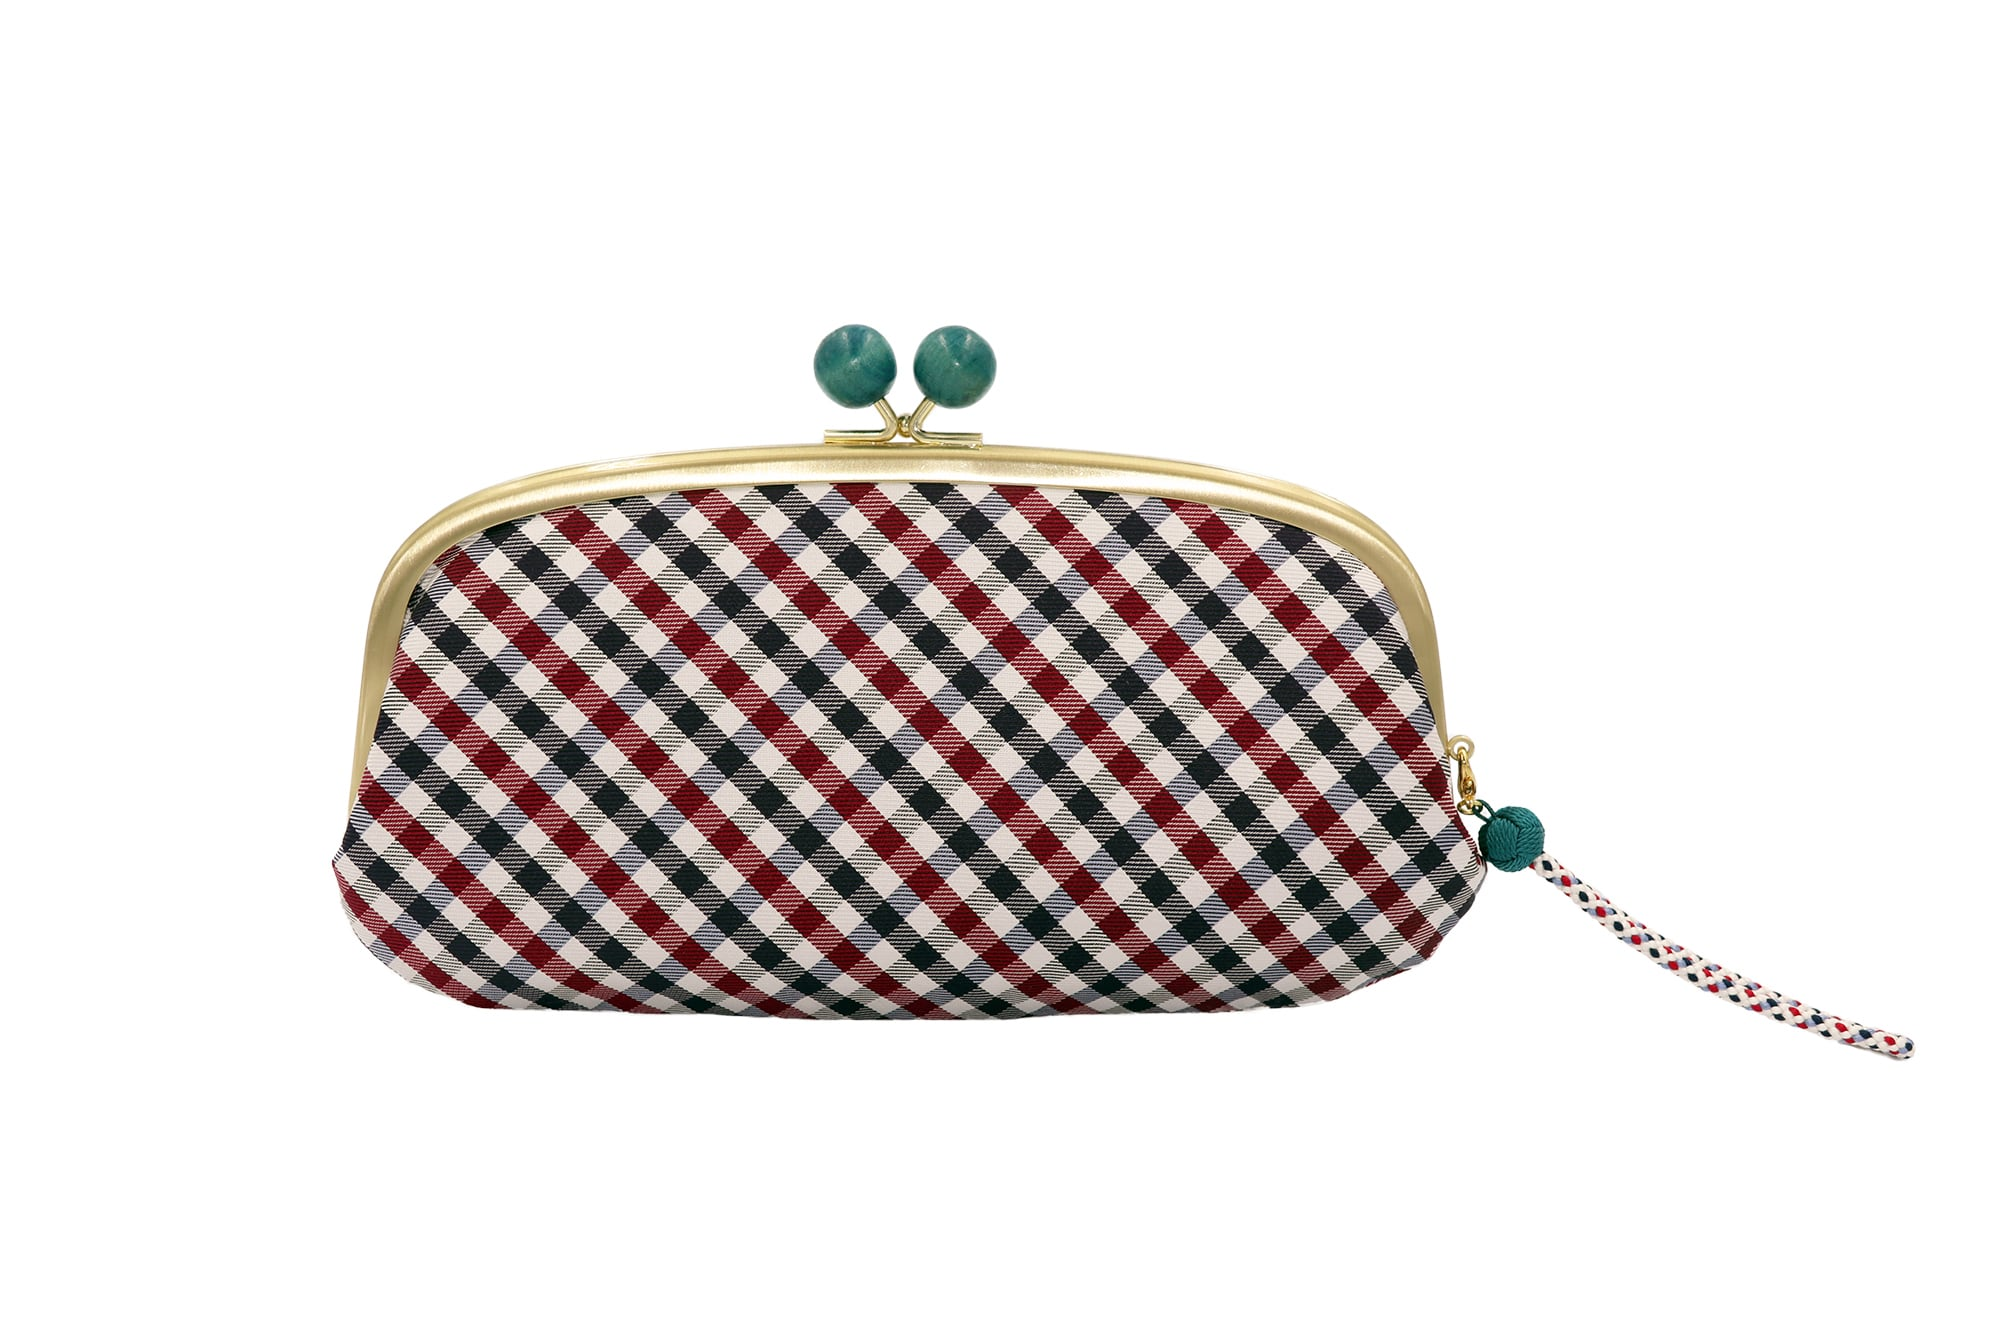 Atelier Kyoto Nishijin/西陣織シルク・がま口長財布・京組紐ストラップ付・ギンガムチェック・ネイビー・日本製